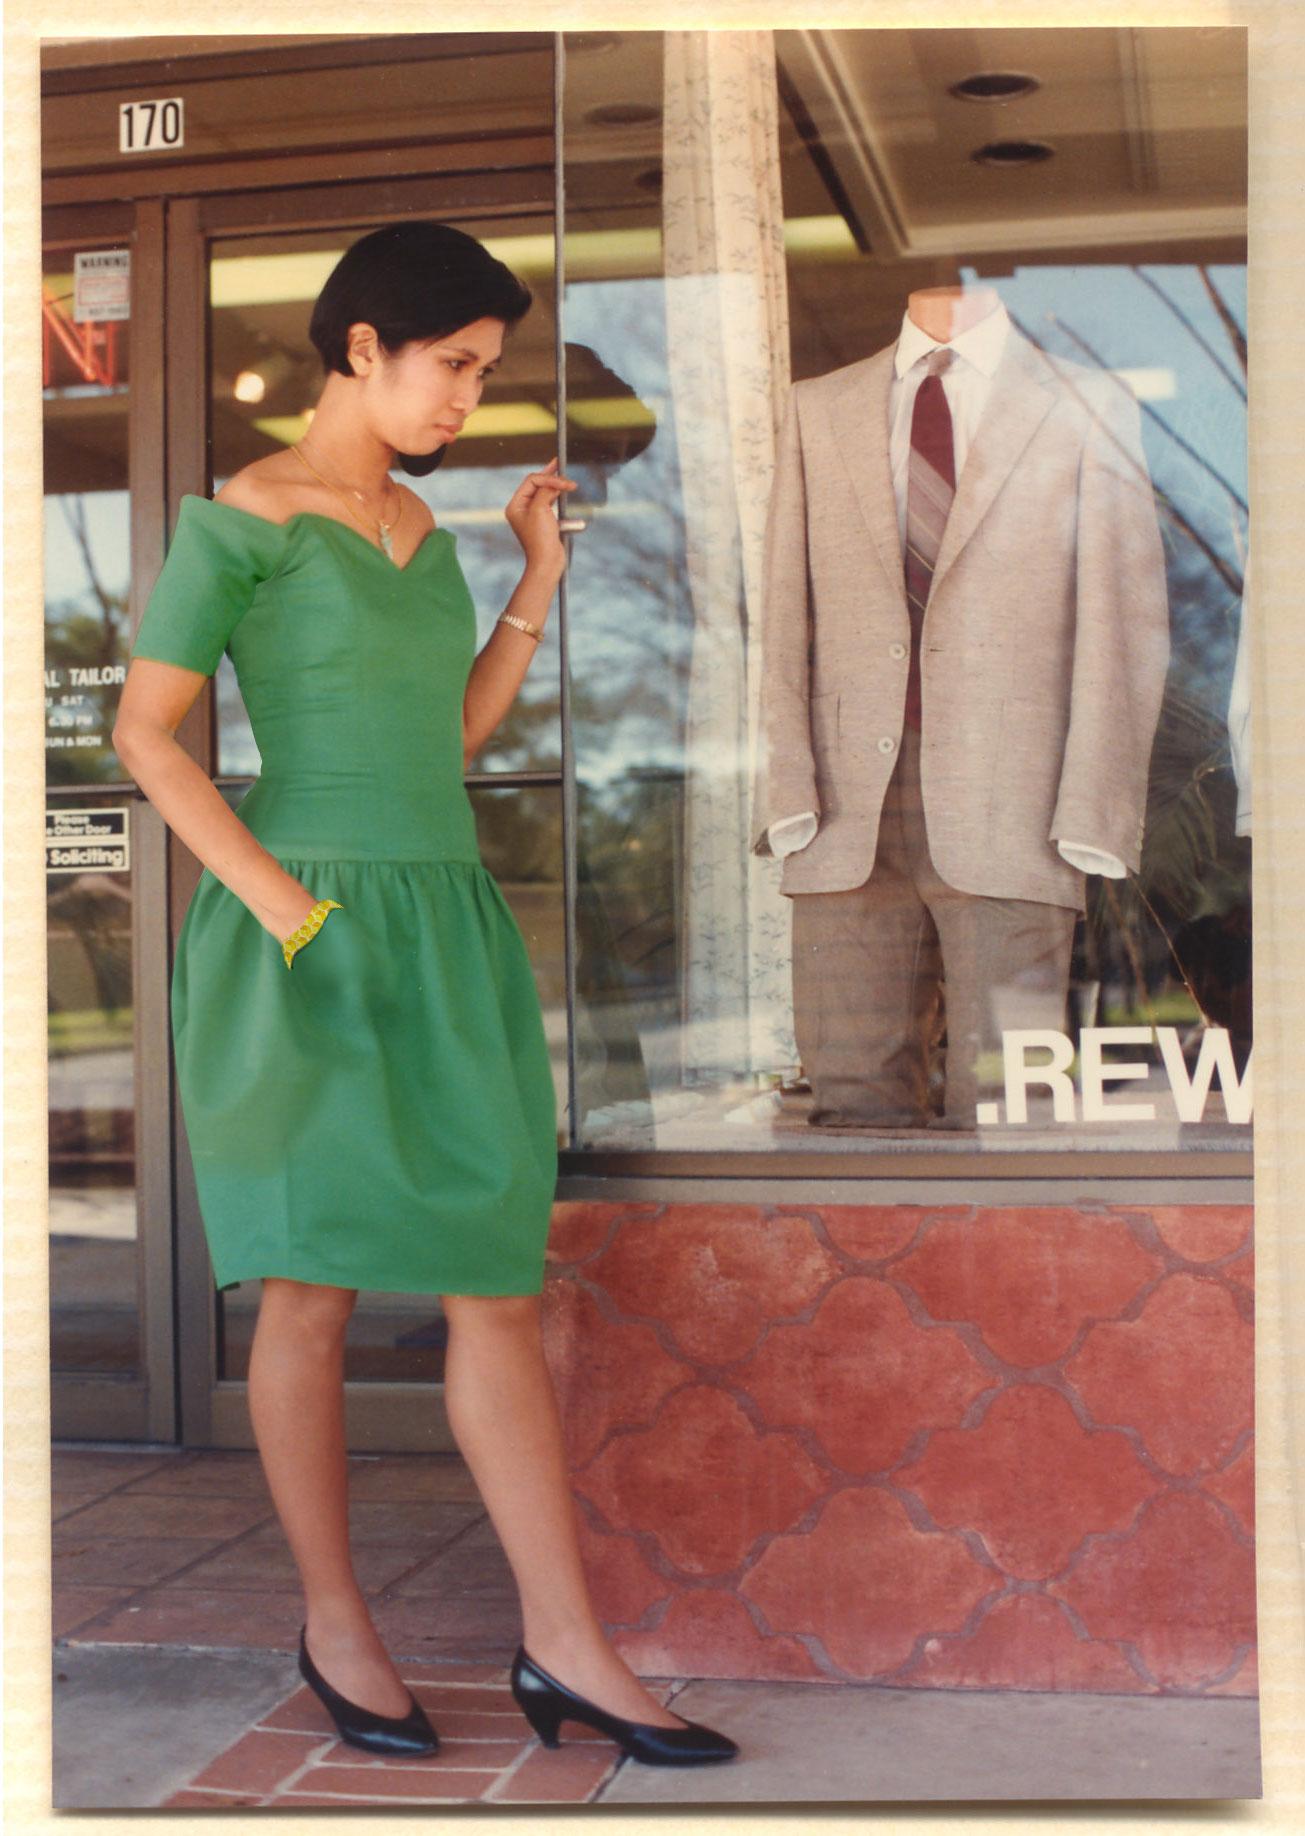 oriental-tailor-shop_dress-pocket_x_180911_nh_v1.1_lr.jpg